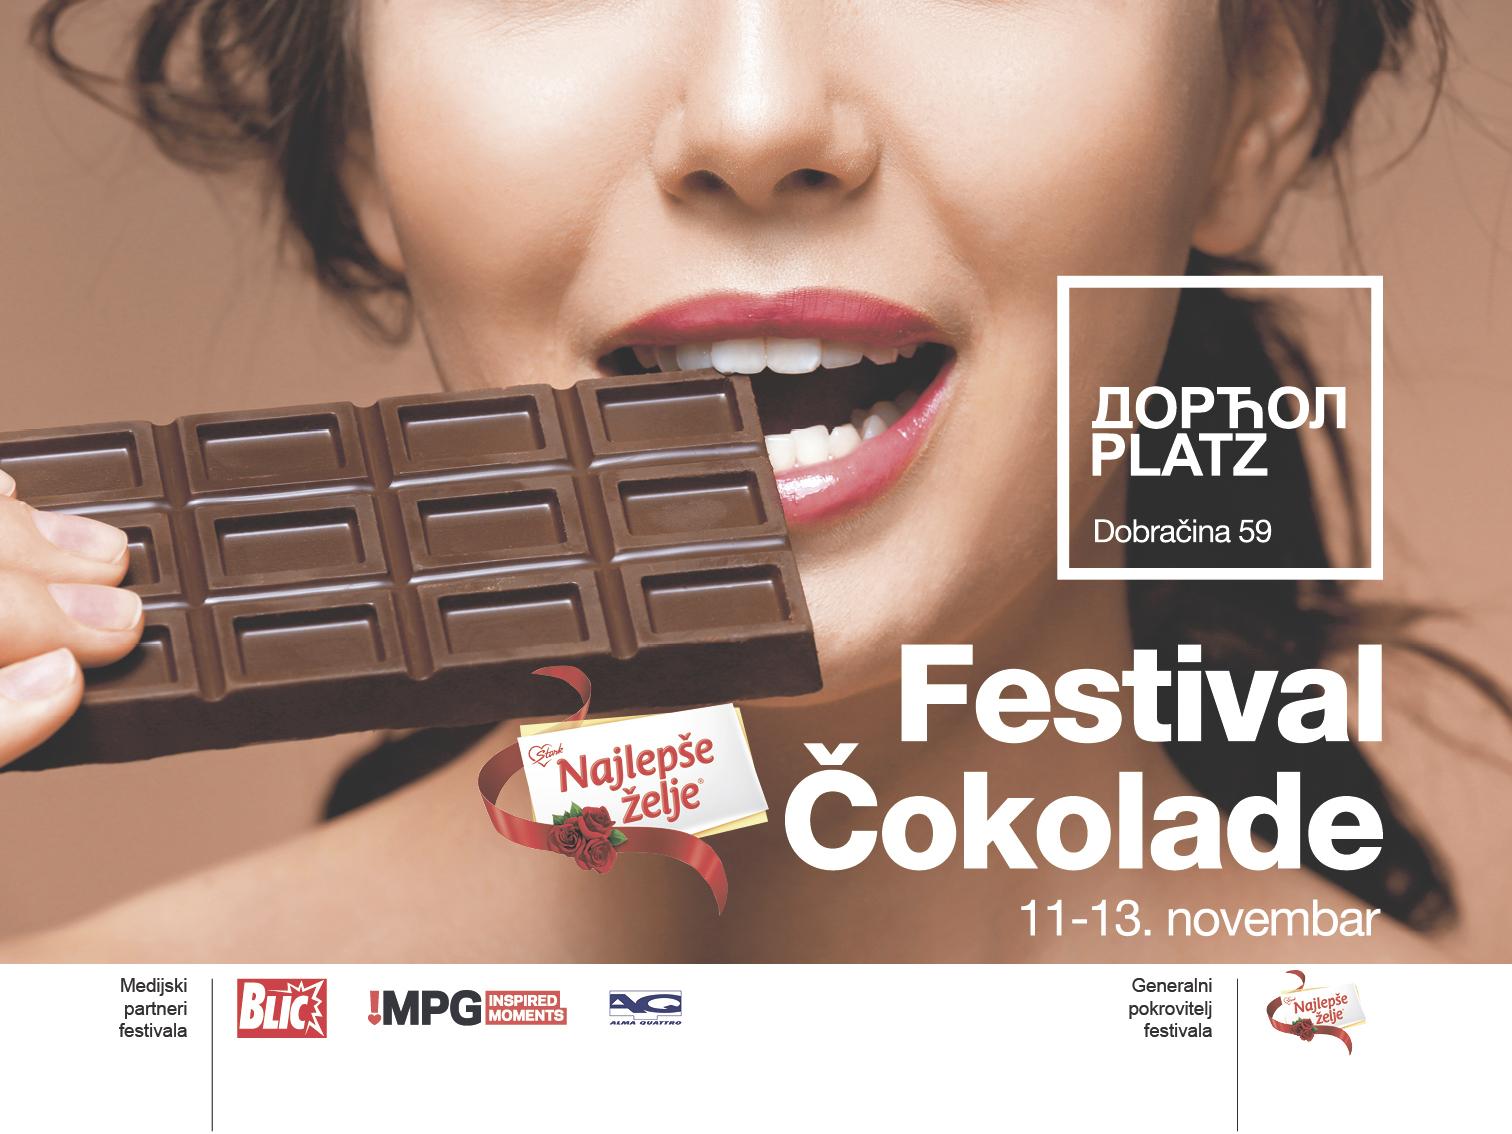 Festival Cokolade 2017, Dorcol Platz